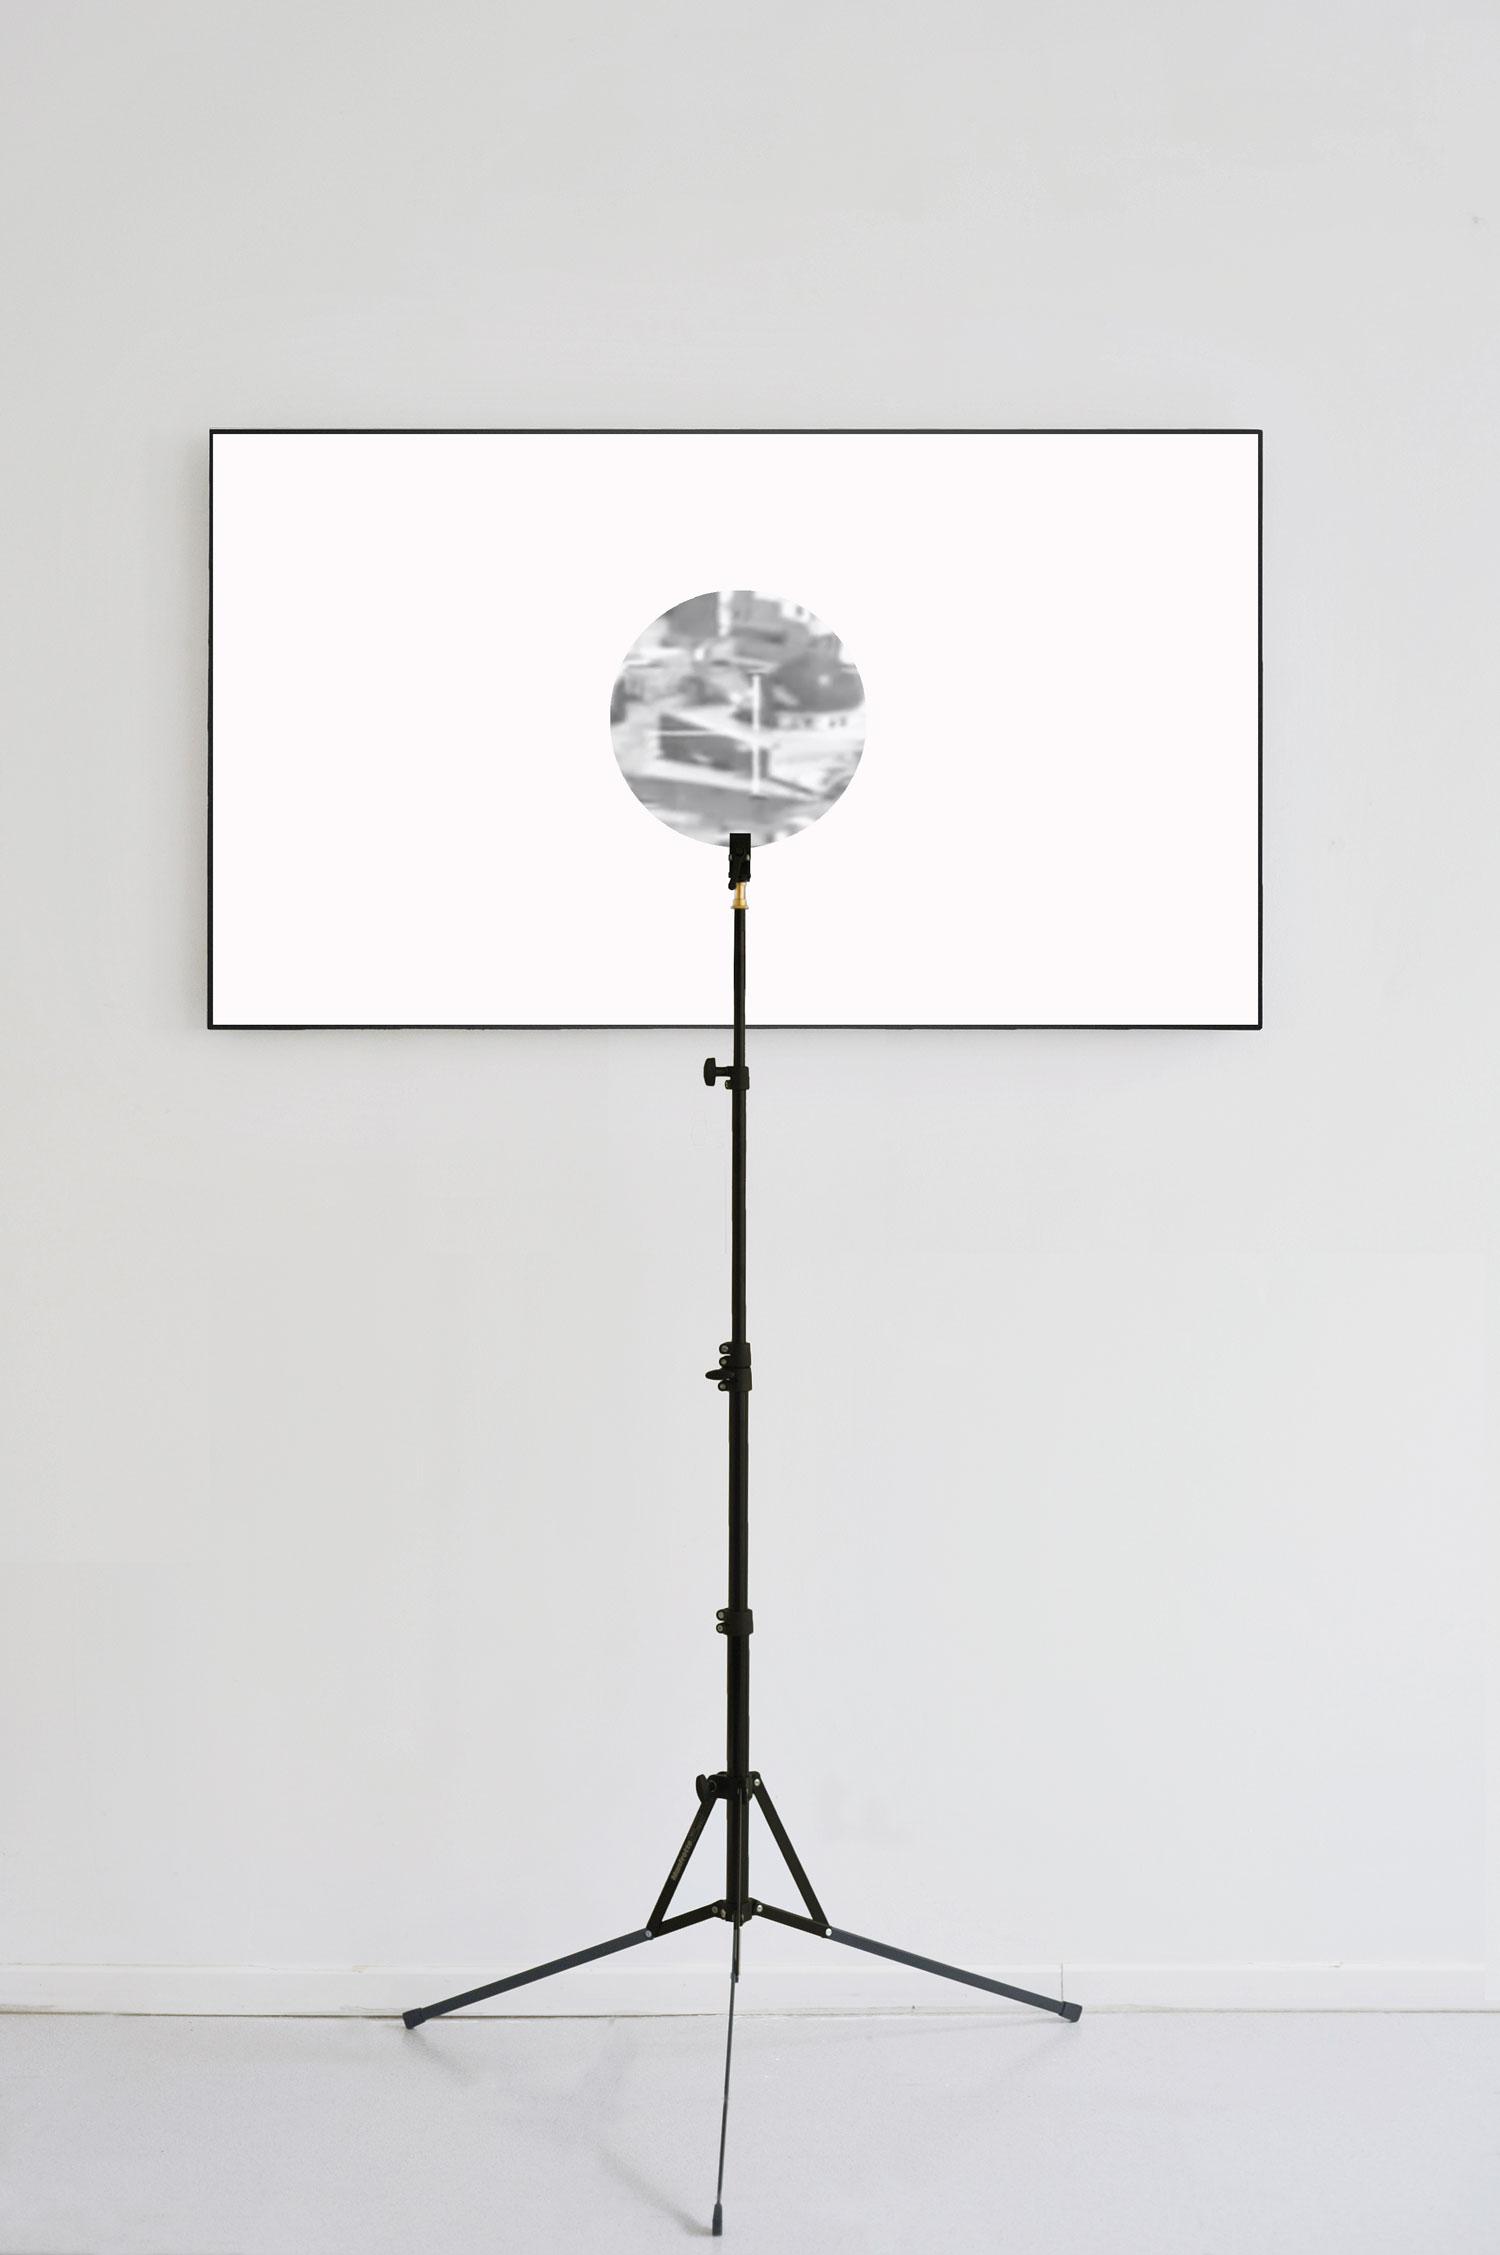 1---Emmanuel-Van-der-Auwera,-VideoSculpture-XXII-(White-Noise),-2020,-55-inch-LCD-screen,-polarization-filter,-plexiglass,-tripod,-cables,-HD-video,-38-min-13-sec,-height-190-cm-height-74-3_4-in,-Ed-3+2-AP